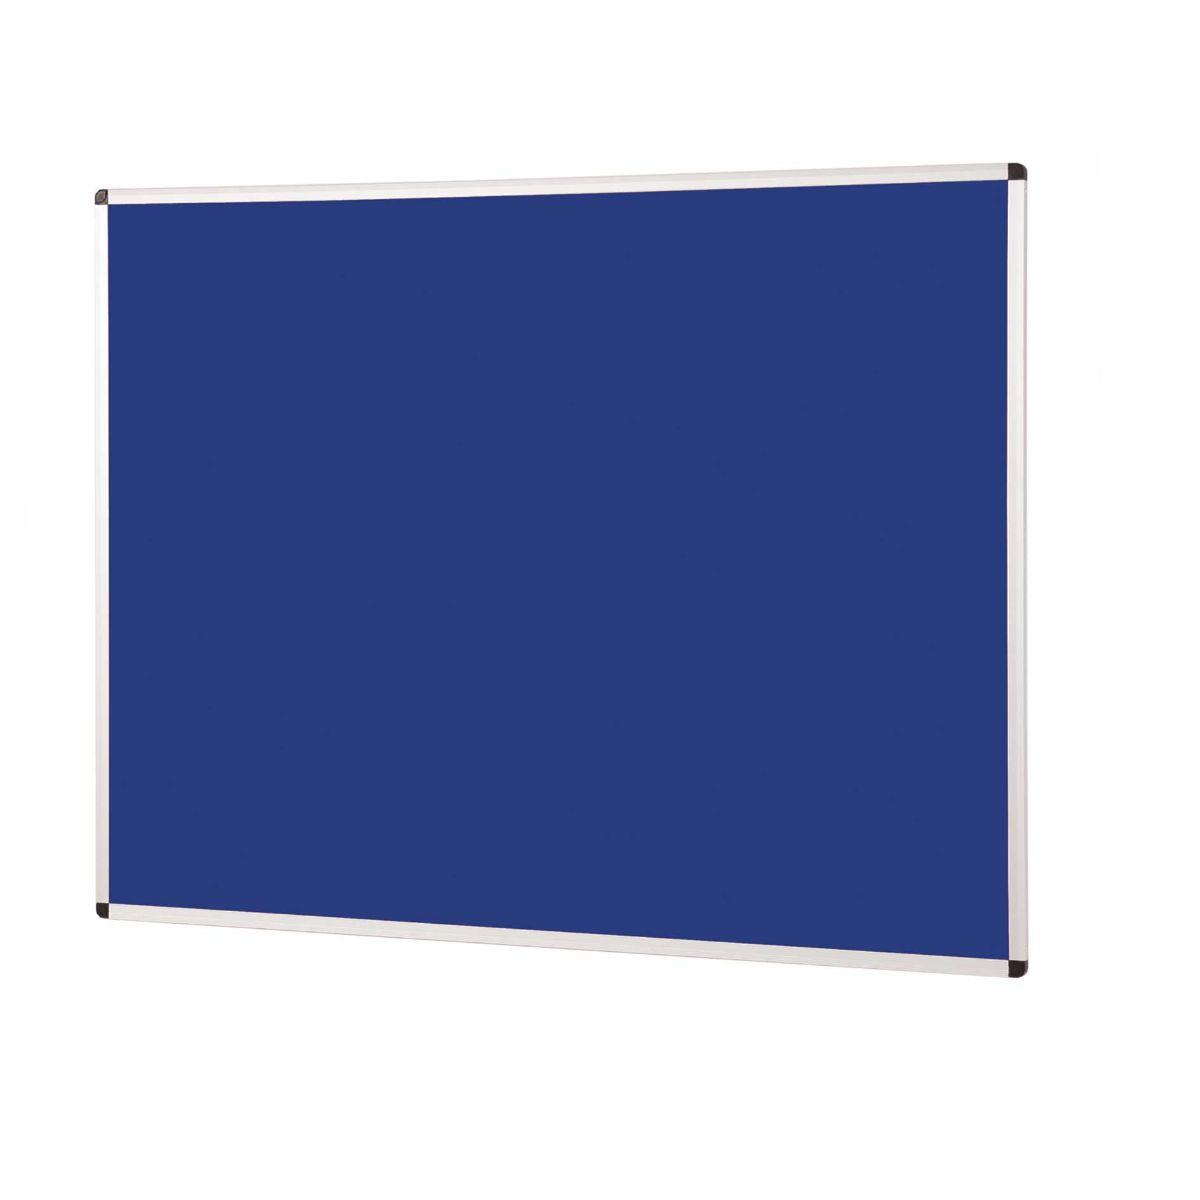 metroplan felt notice board 1200x900mm aluminium, blue